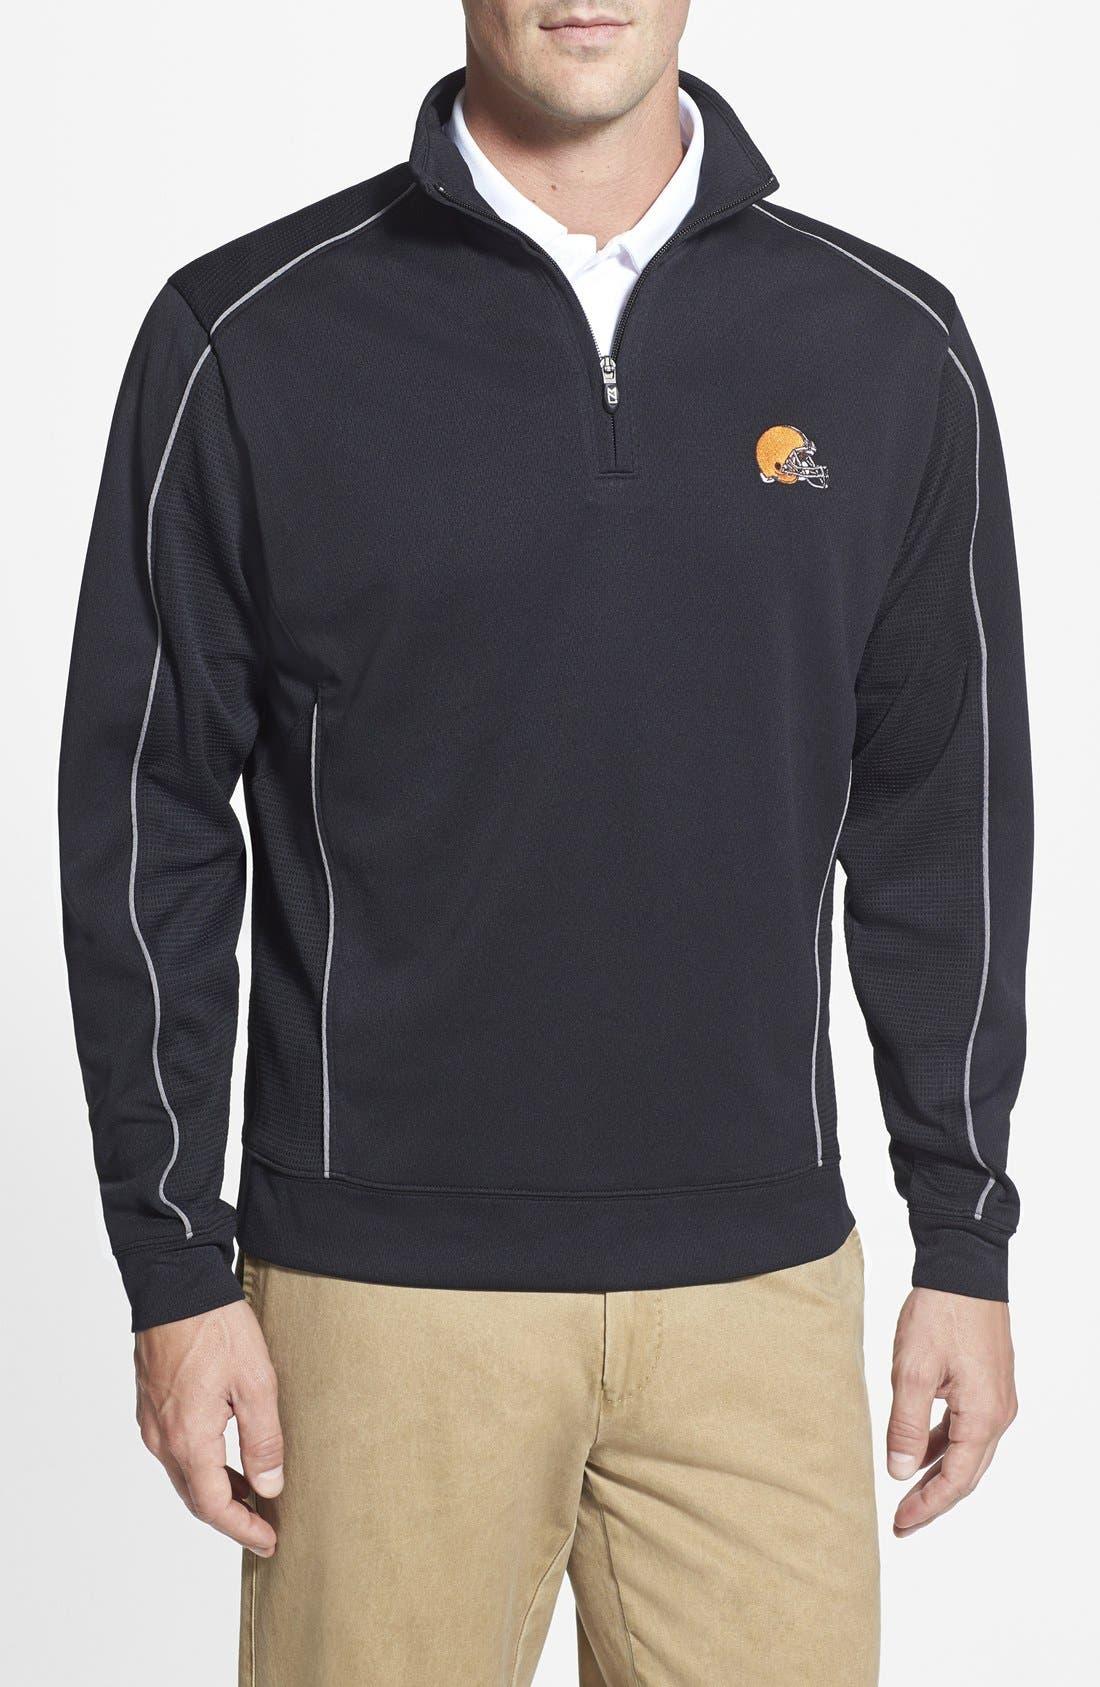 Main Image - Cutter & Buck Cleveland Browns - Edge DryTec Moisture Wicking Half Zip Pullover